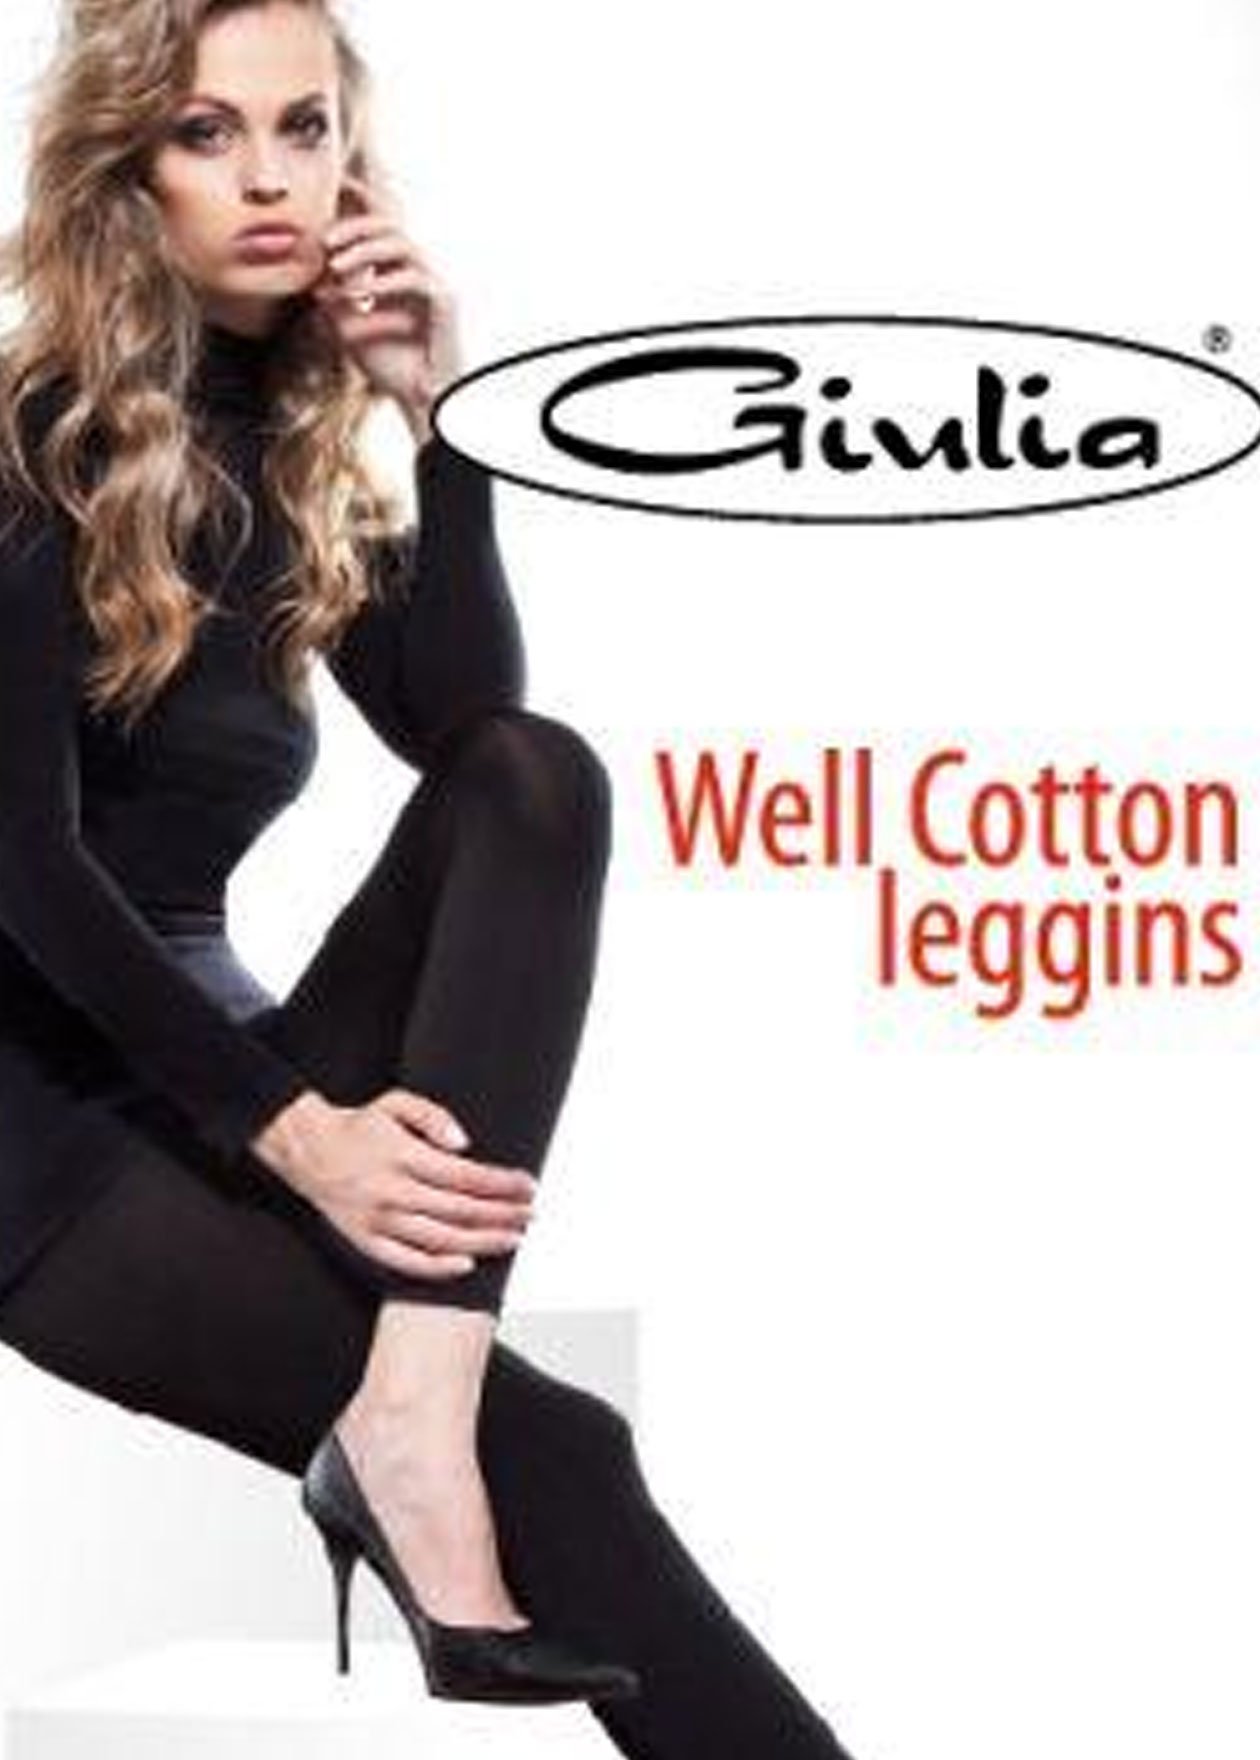 Giulia Well Cotton